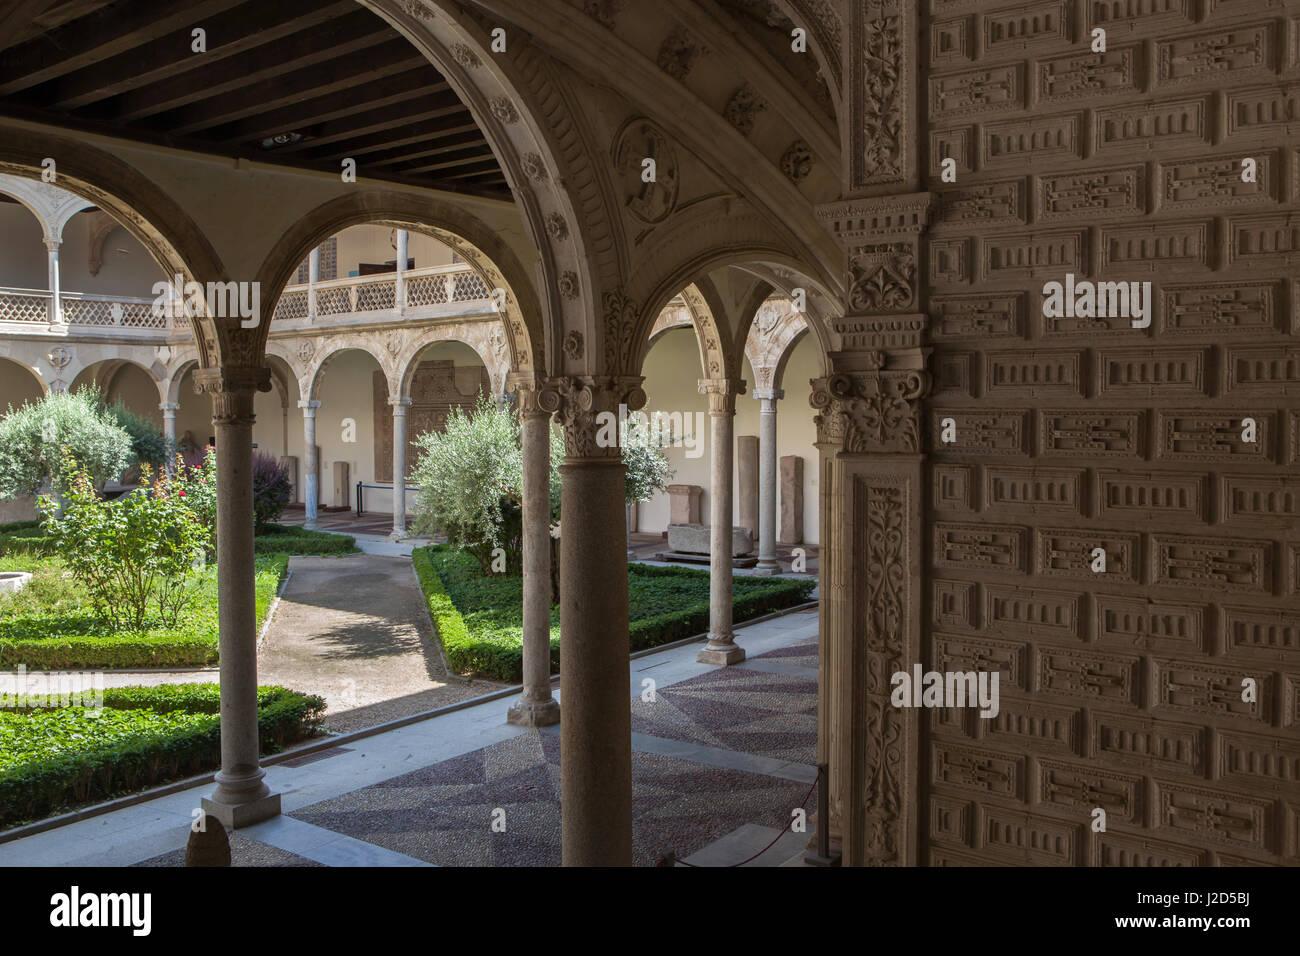 Noble Cloister of the former Hospital de Santa Cruz designed by Spanish Renaissance (Plateresque) architect Alonso - Stock Image